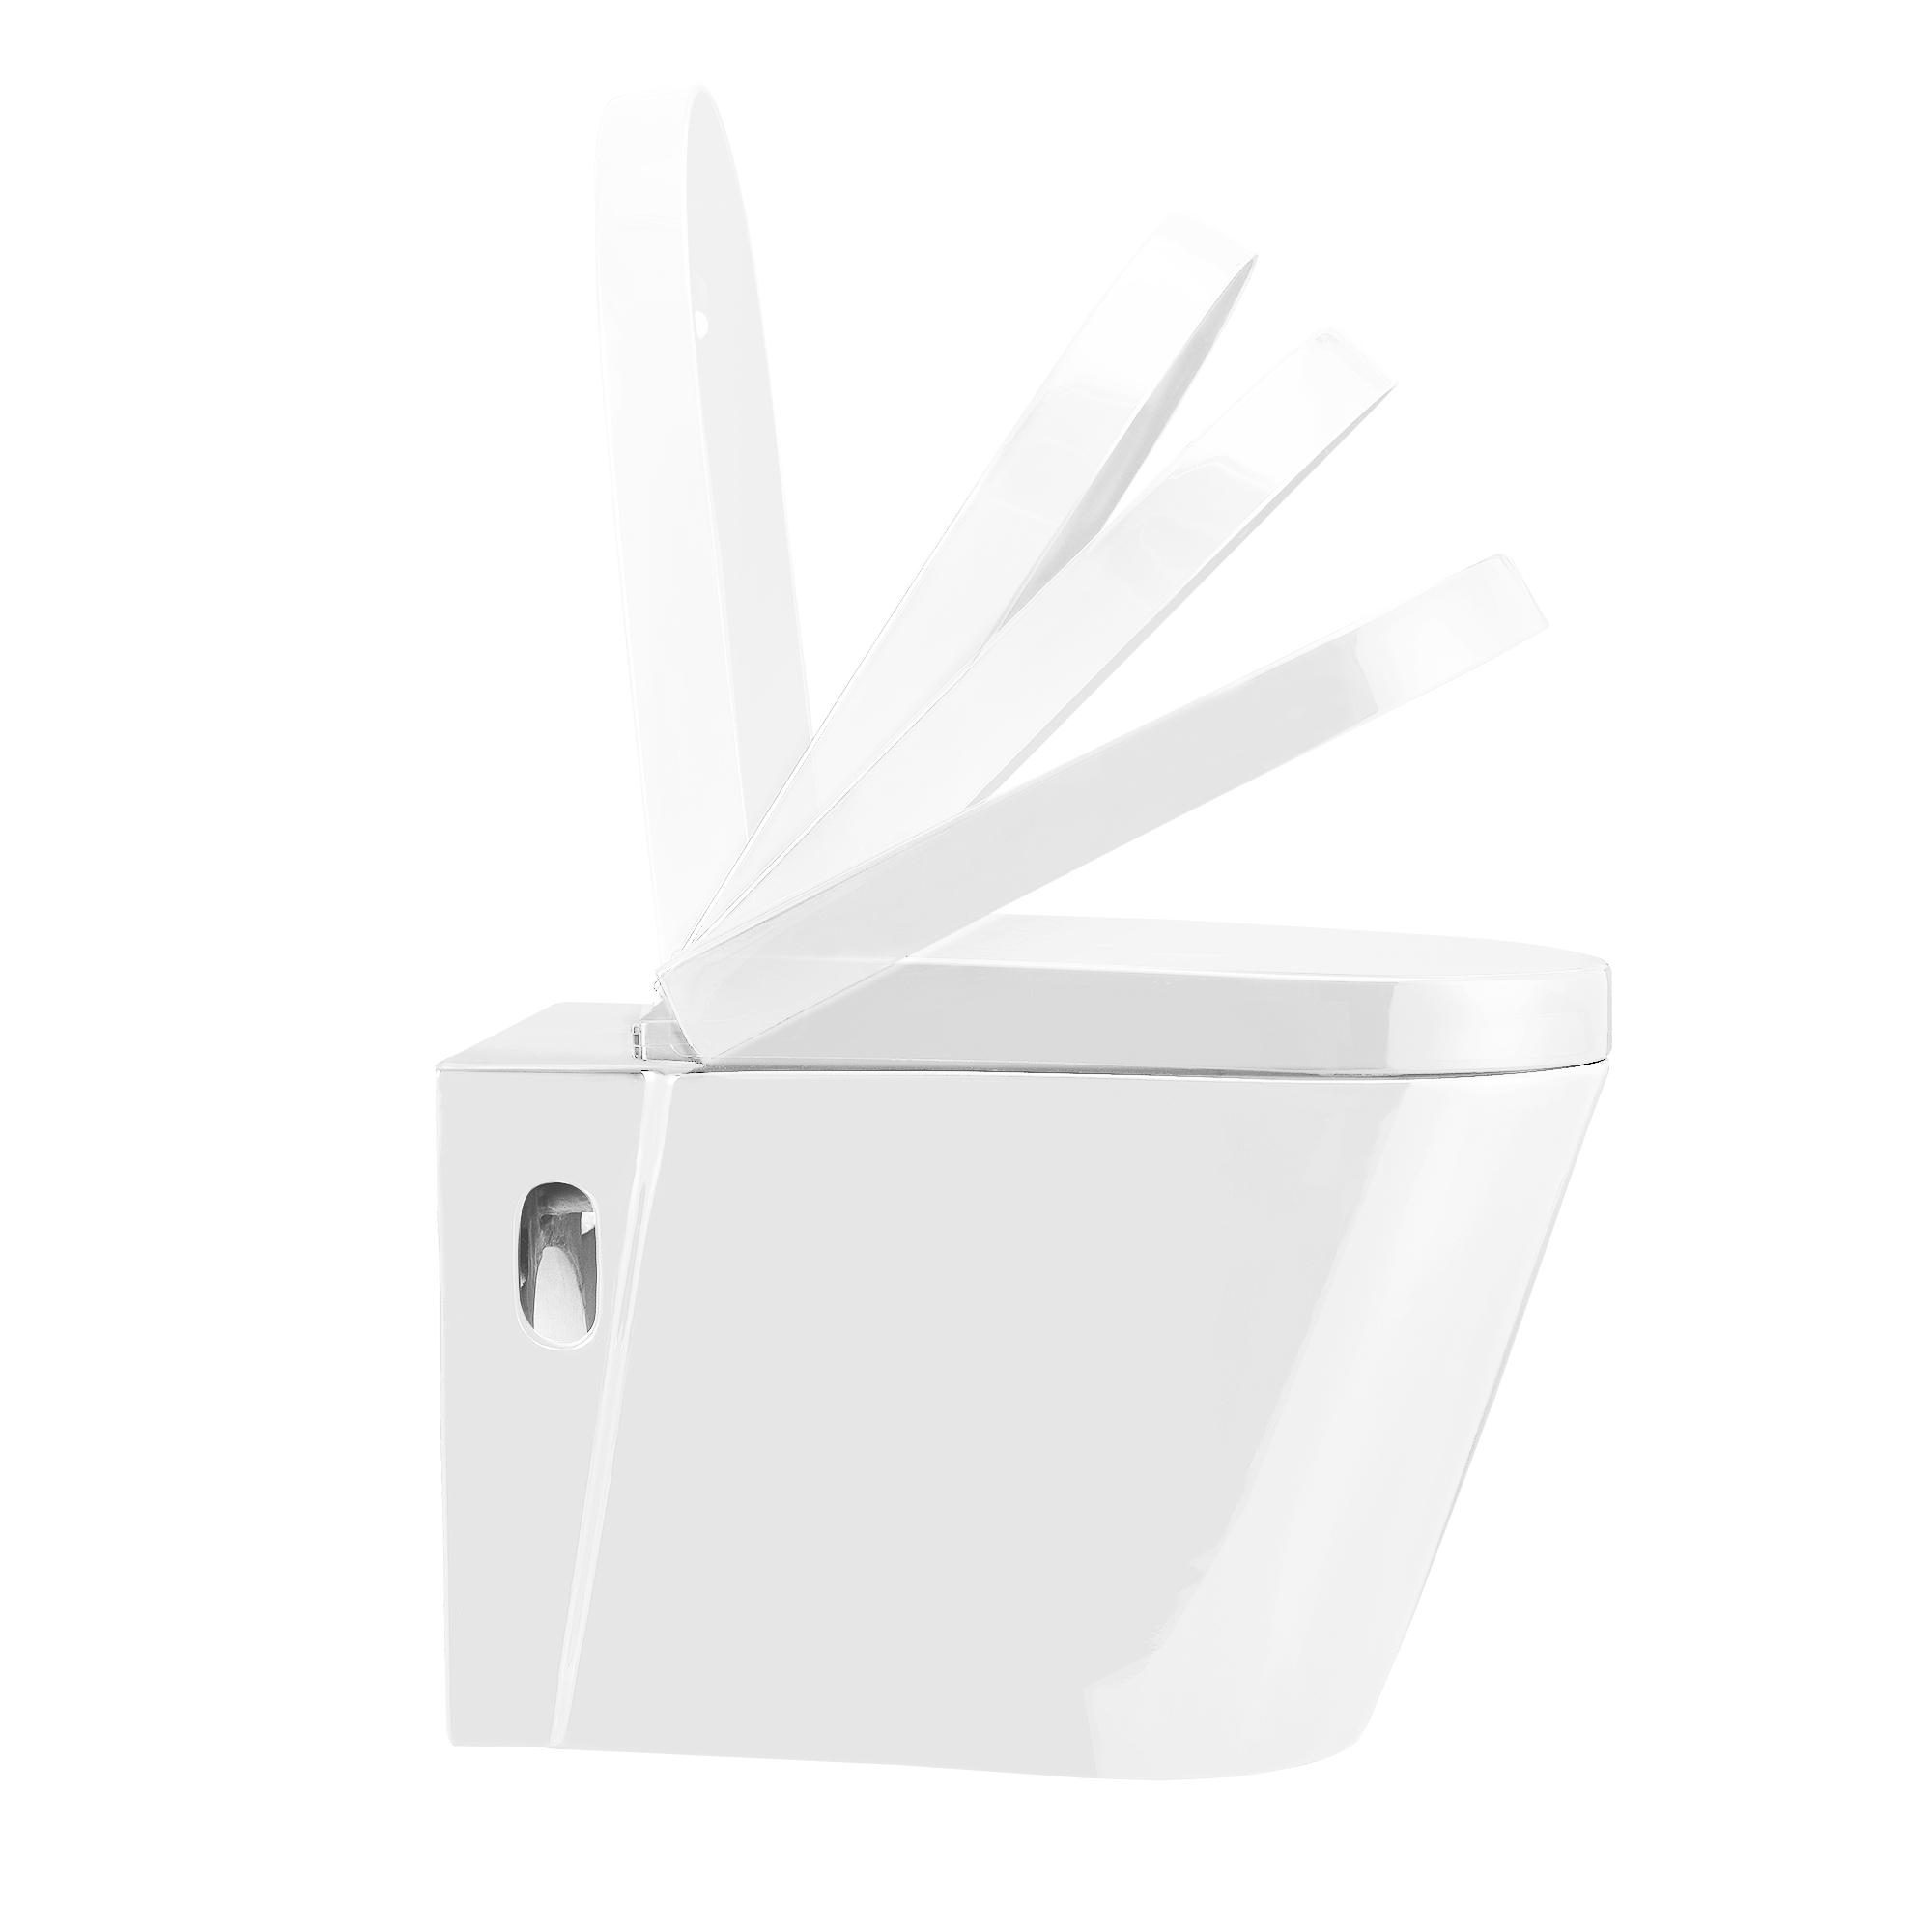 keramik wand h nge wc sp lkasten wei absenkautomatik toilette klo ebay. Black Bedroom Furniture Sets. Home Design Ideas